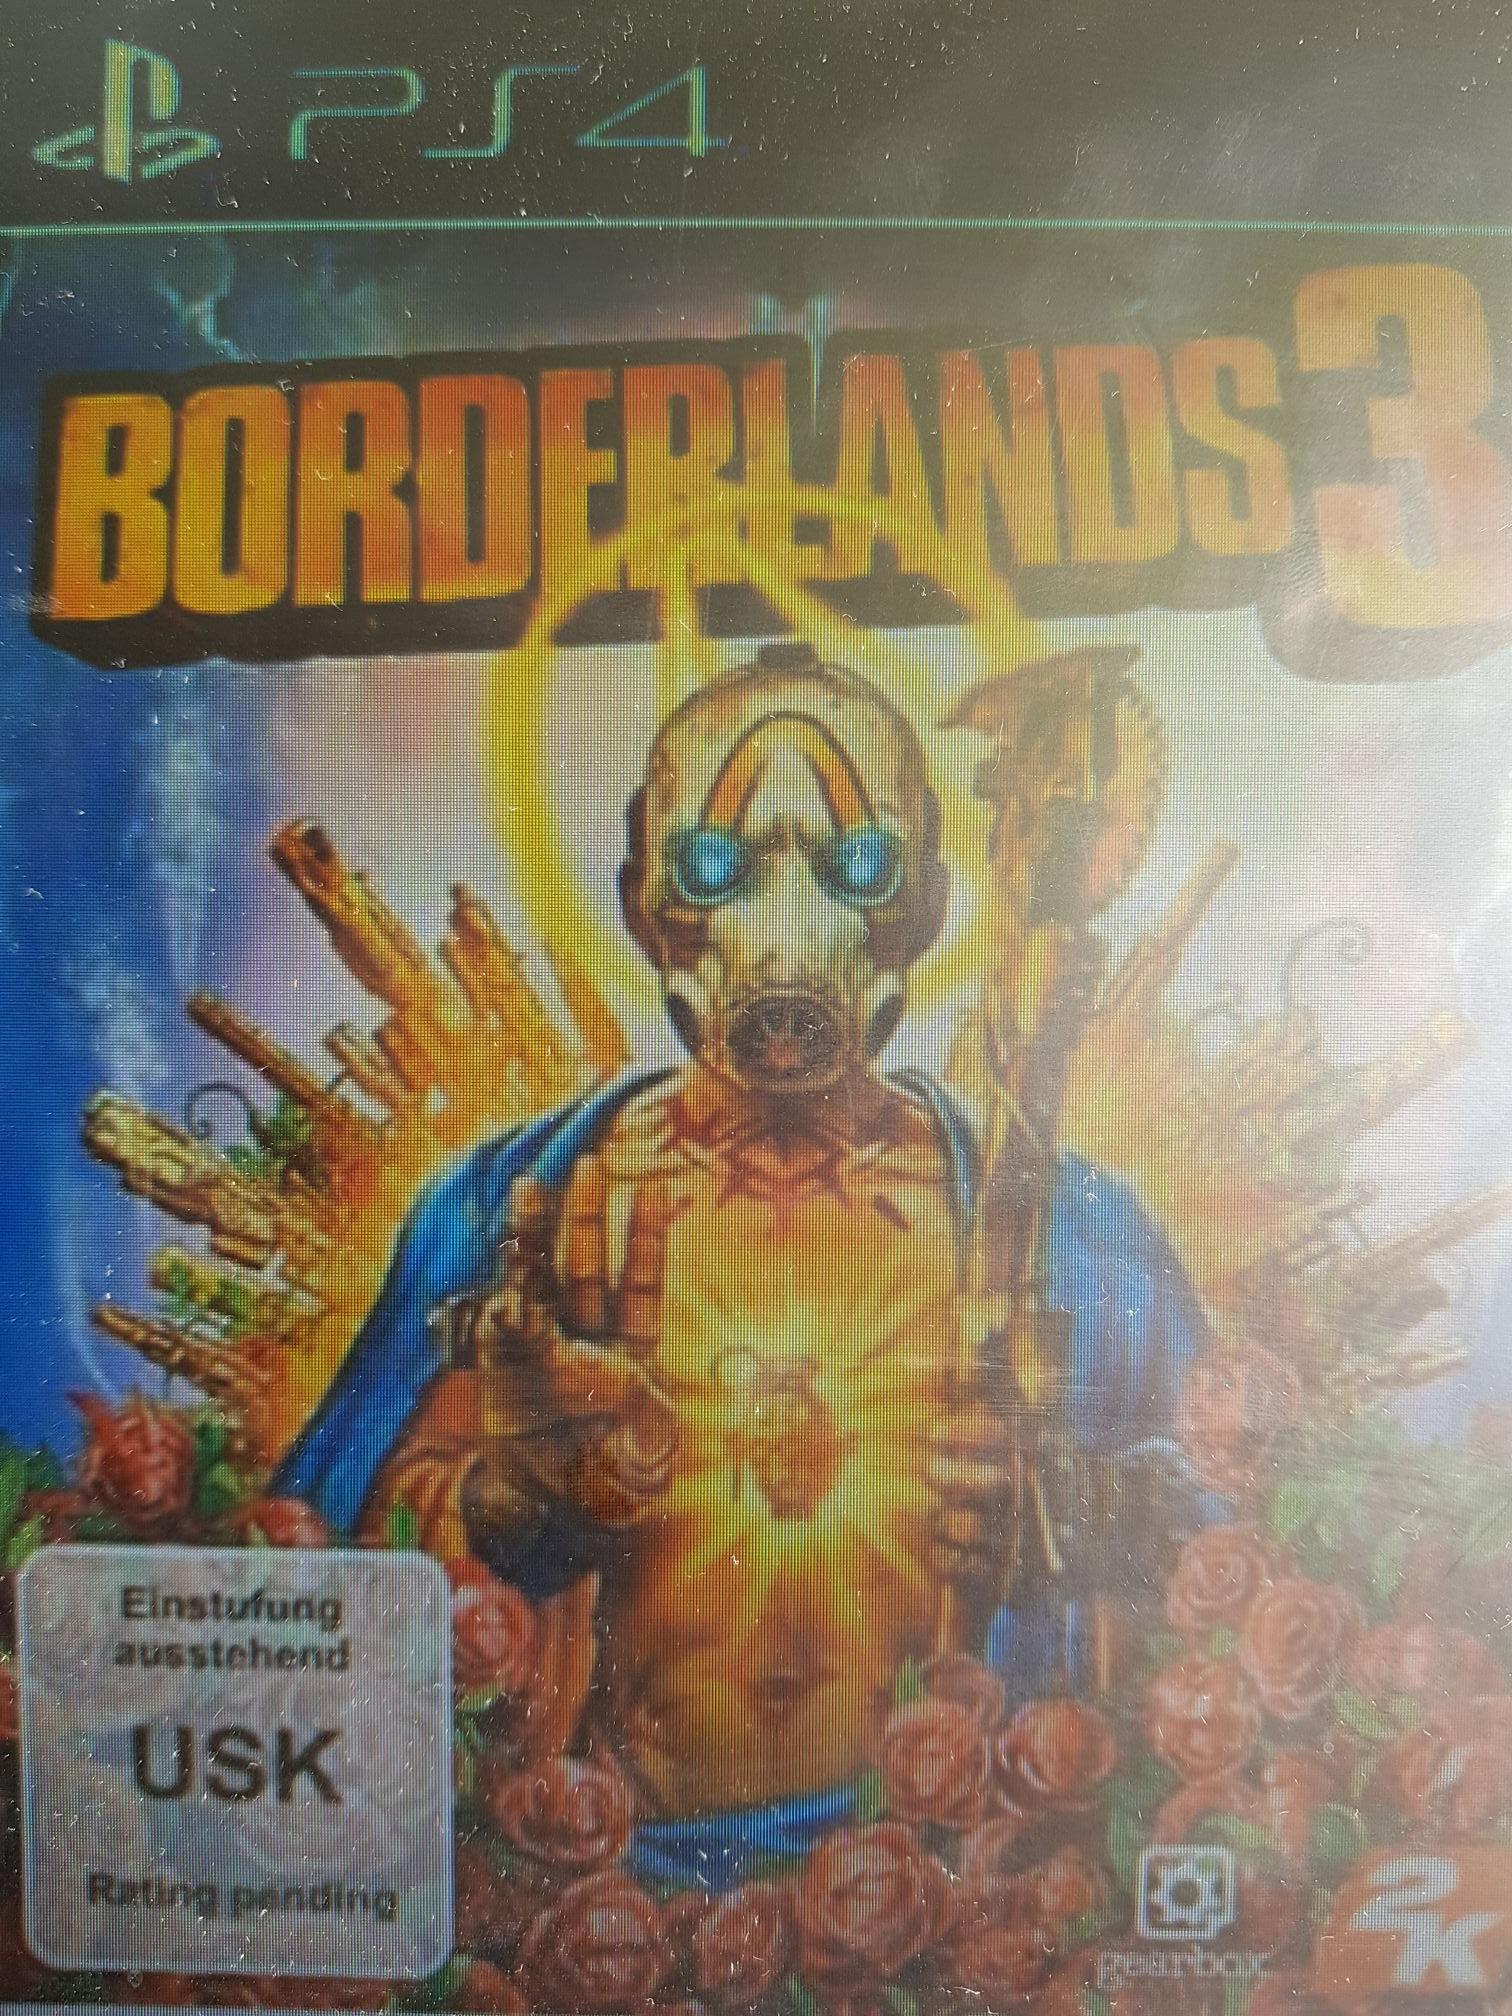 Borderlands 3 Playstation 4 Gamesflat